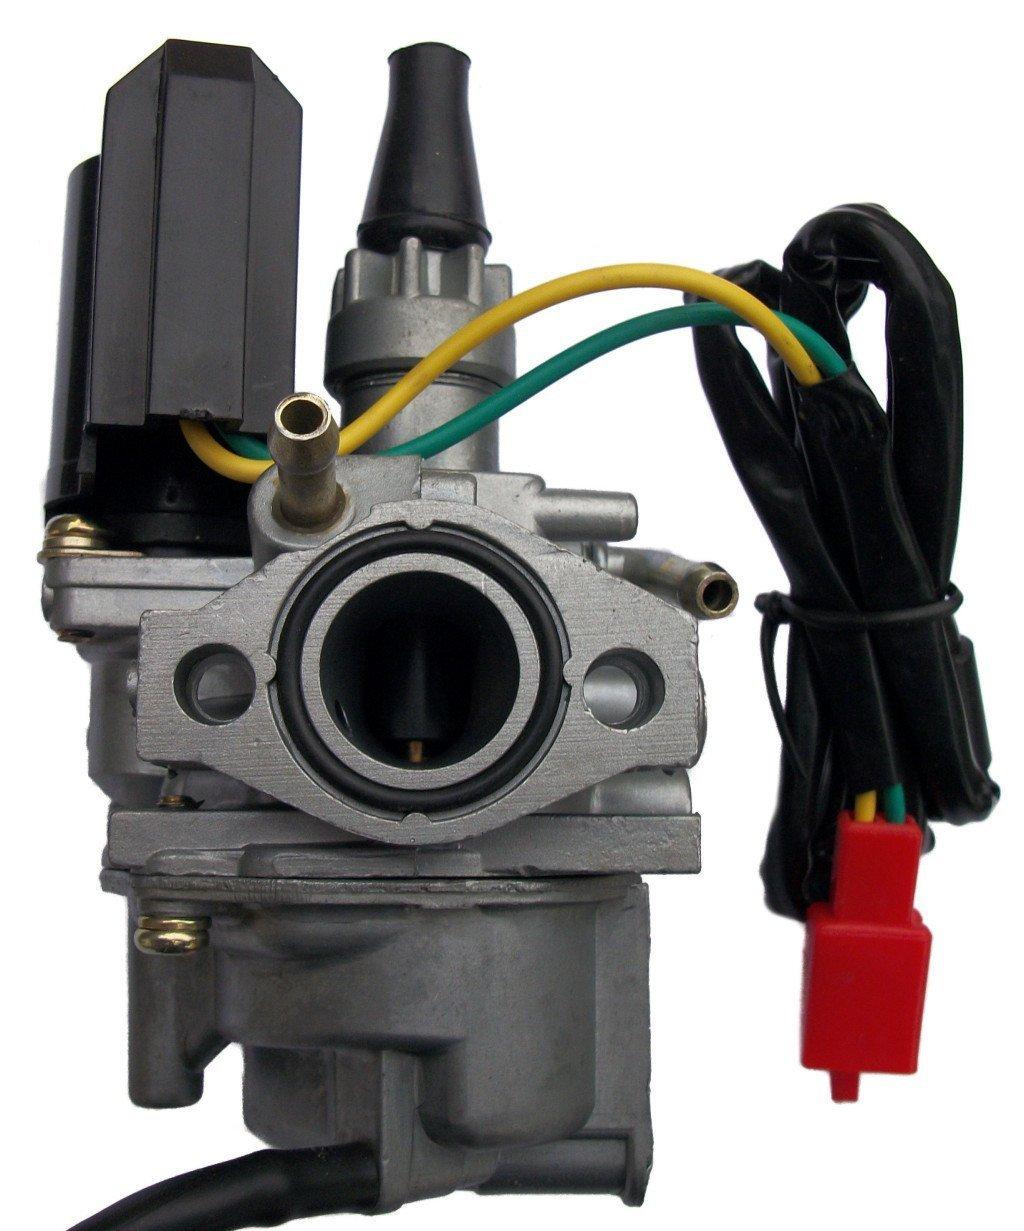 amazon com: carburetor for honda tg 50 tg50 tg 50m tg50m gyro 3 wheel carb  carby 1985 1986: automotive